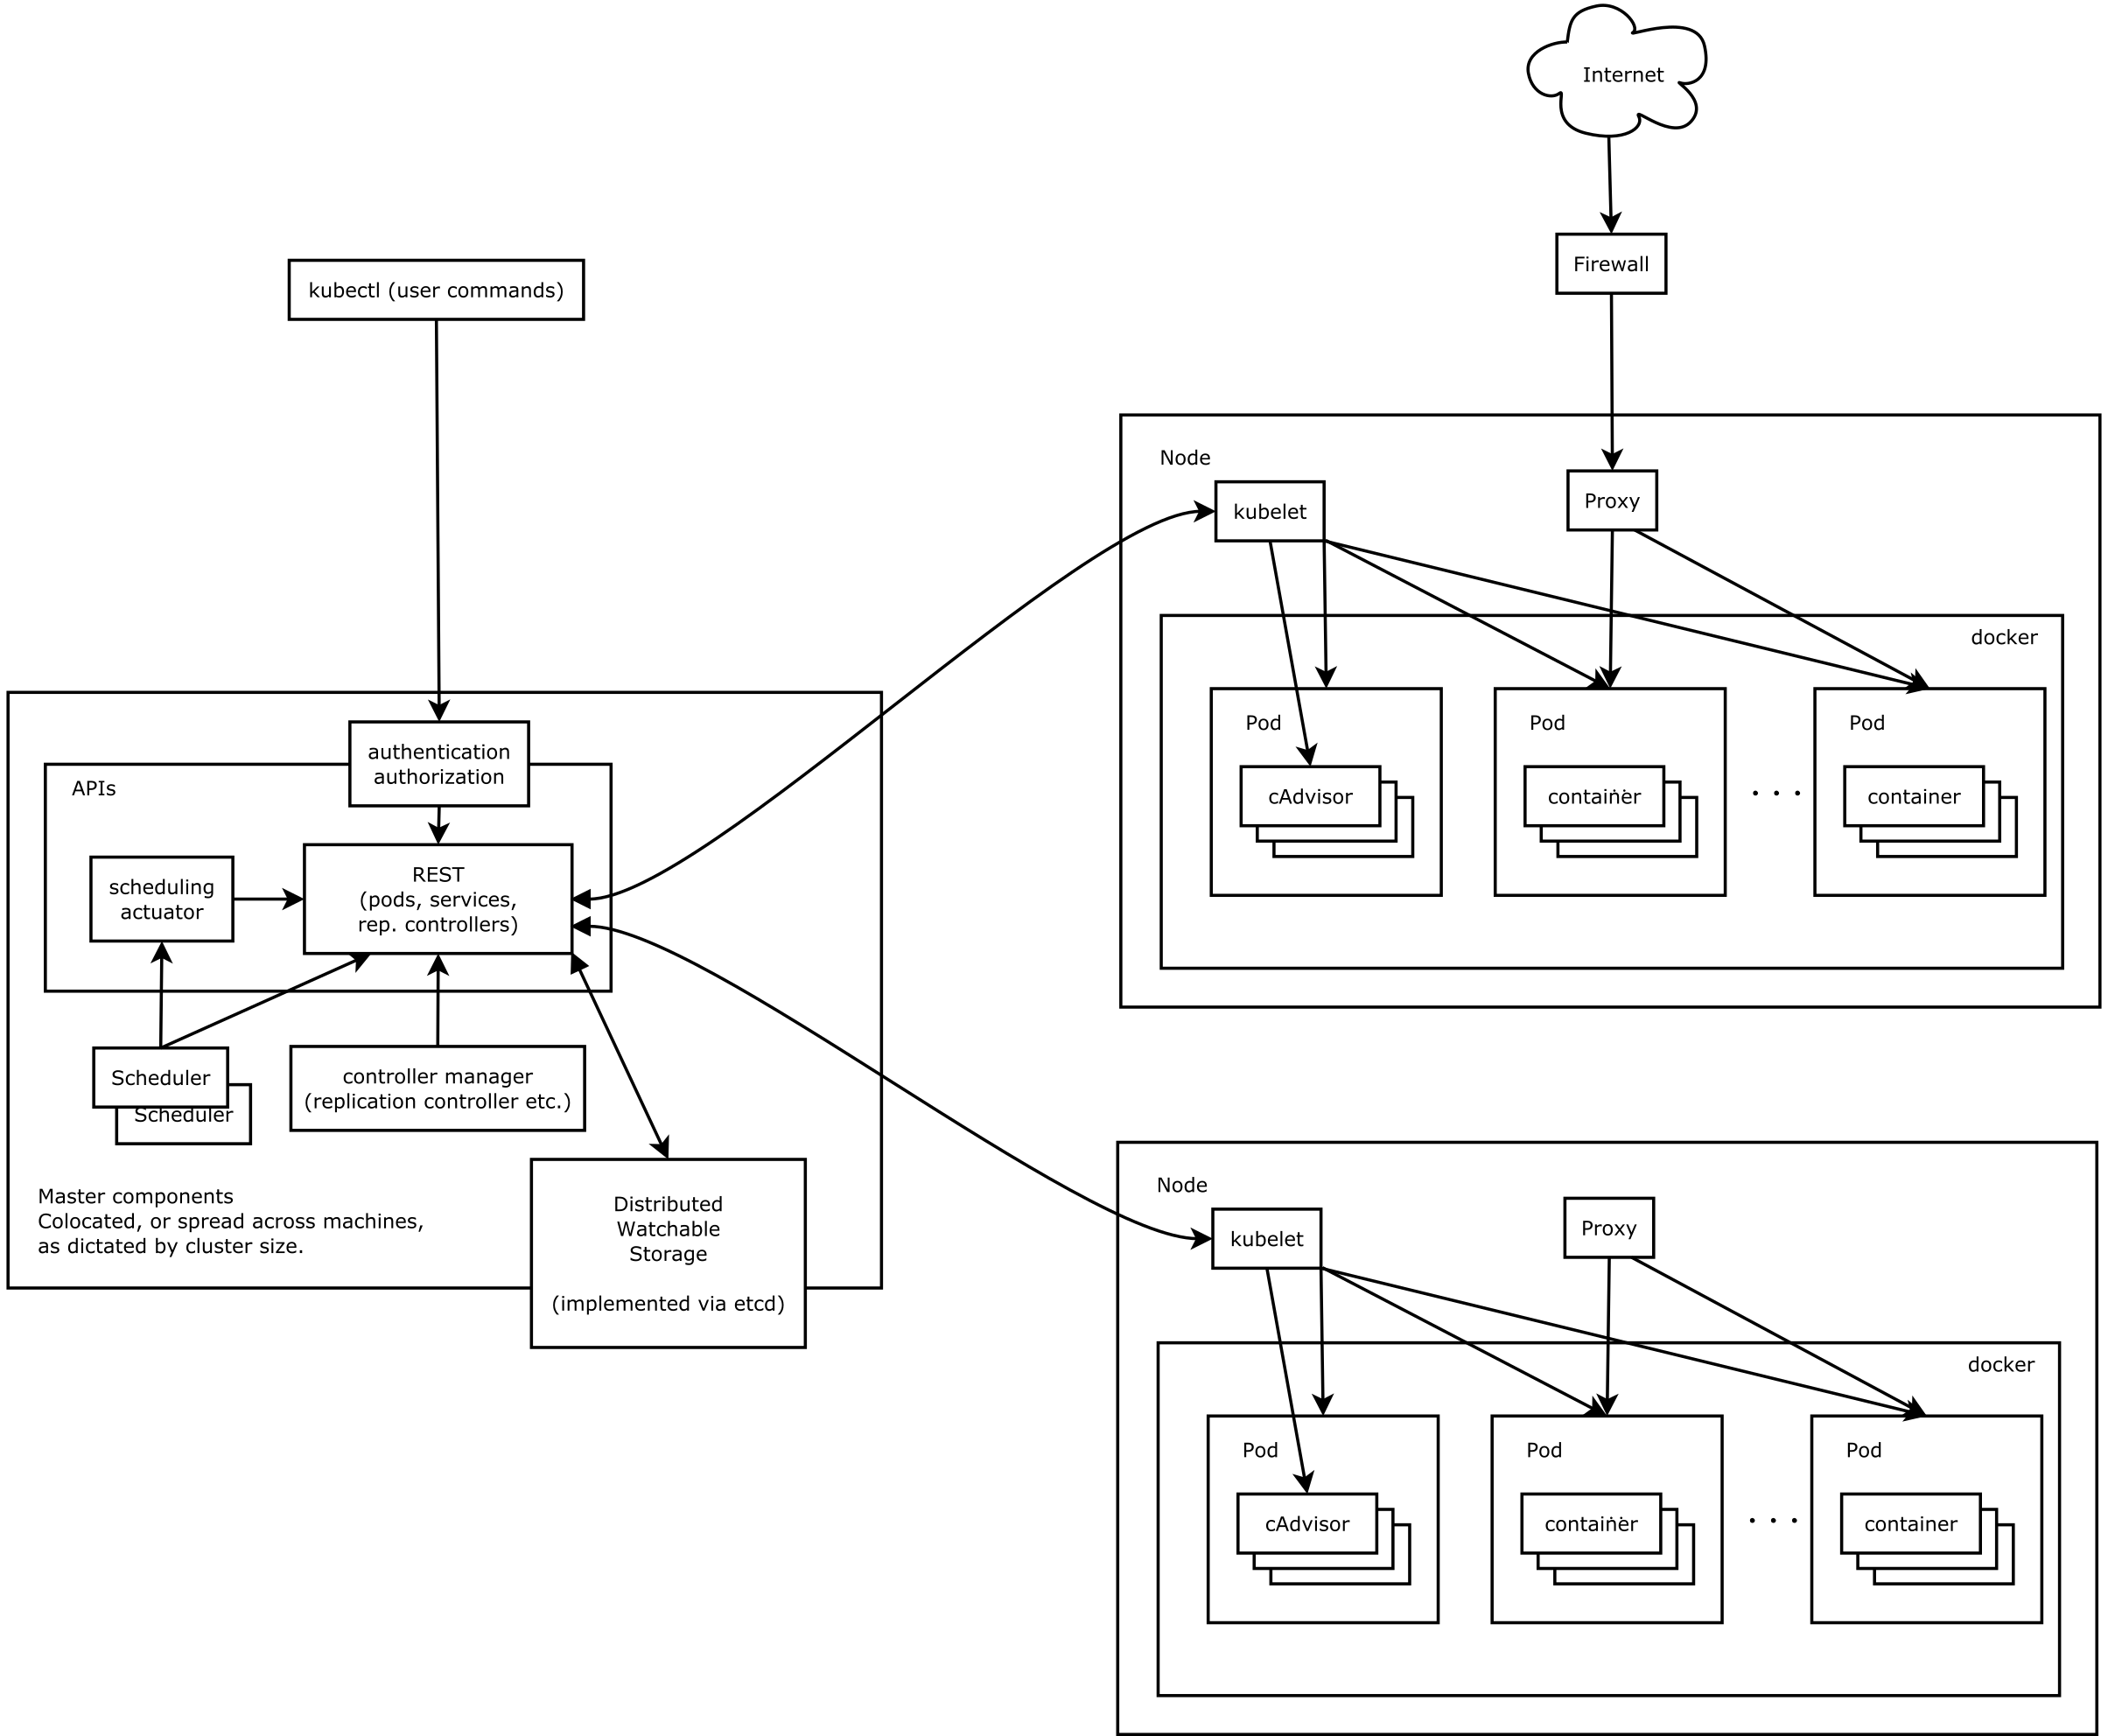 k8s架构图